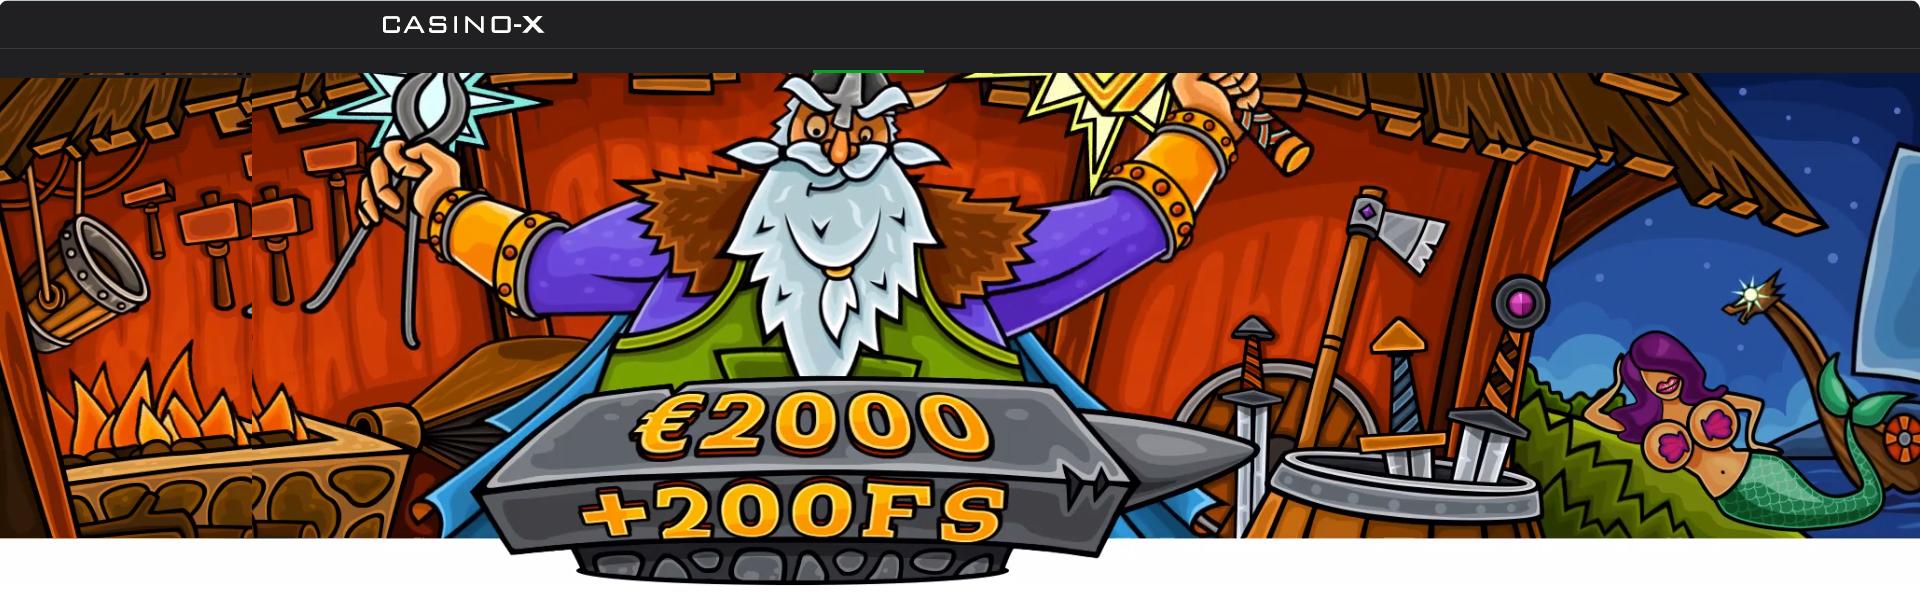 Casino-X Bonuses.